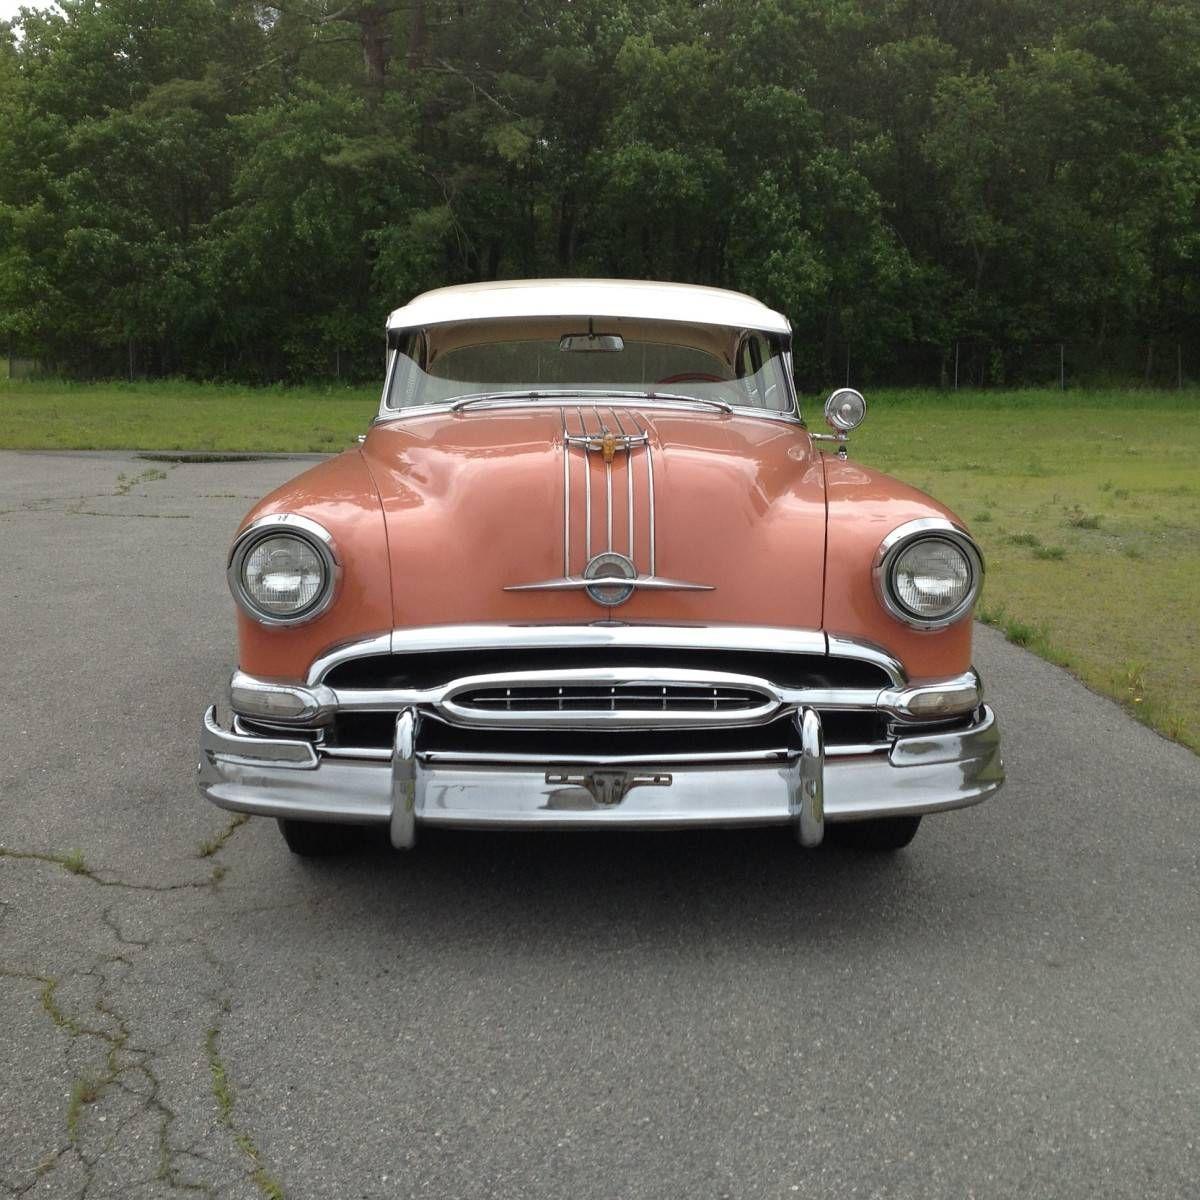 1954 Pontiac Starchief for sale #1962883 - Hemmings Motor News ...